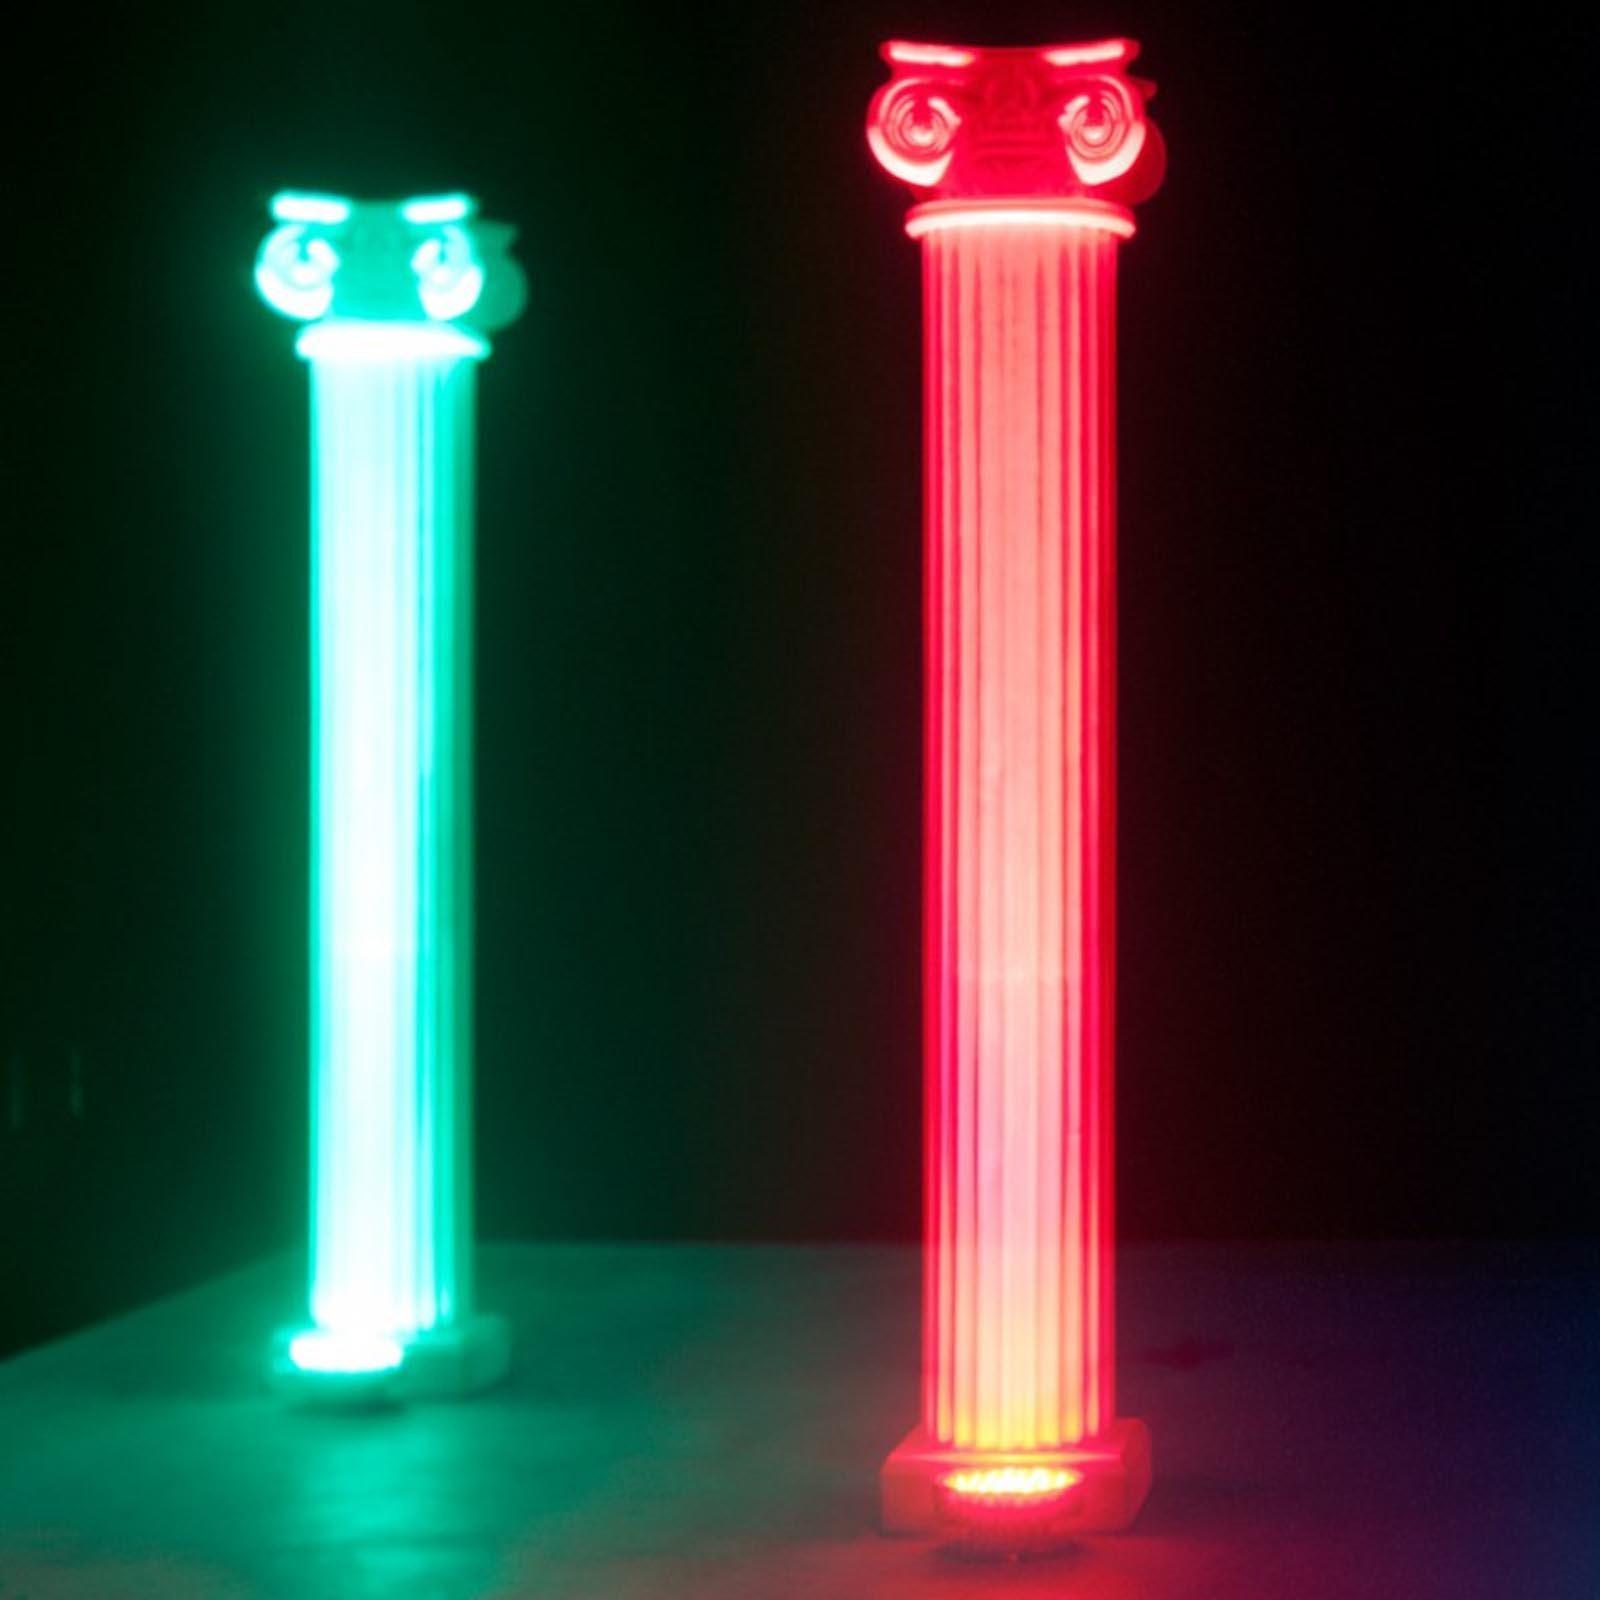 American DJ ADJ Mega Par Profile Plus LED RGB+UV Slim Par Can Wash Effect Light (6 Pack) by ADJ (Image #10)